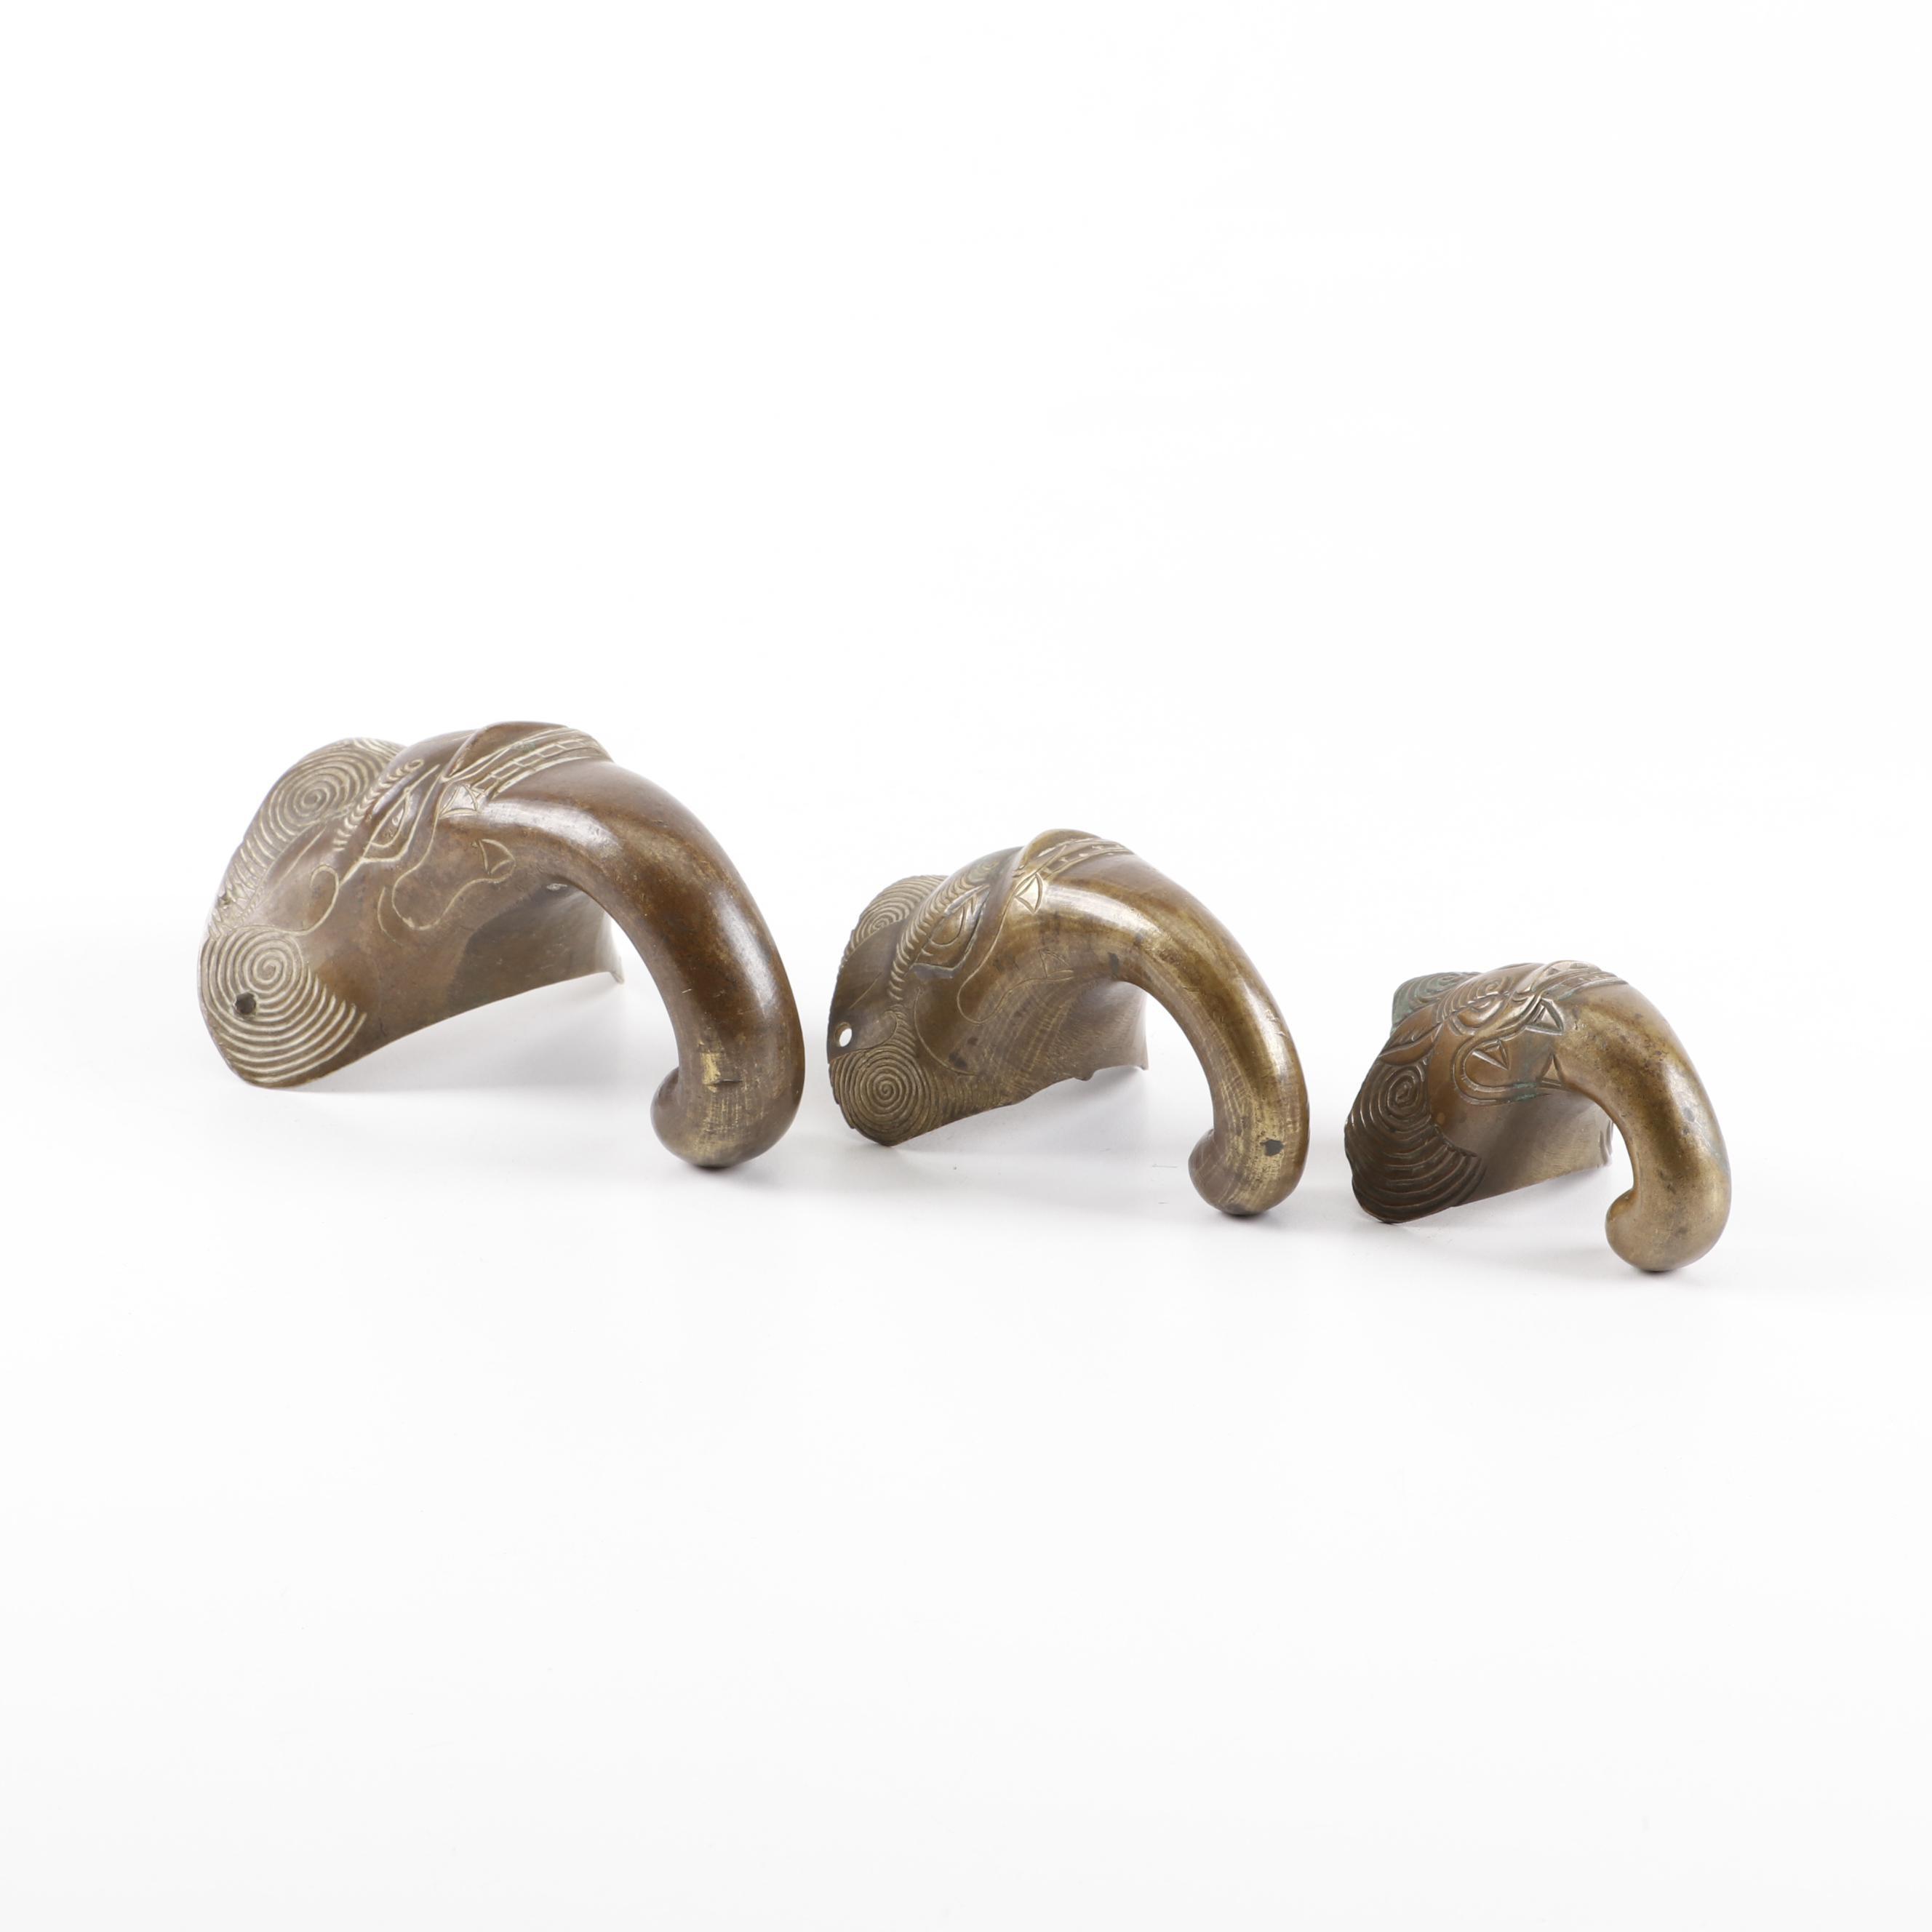 Southeast Asian Etched Brass Elephant Motif Decor